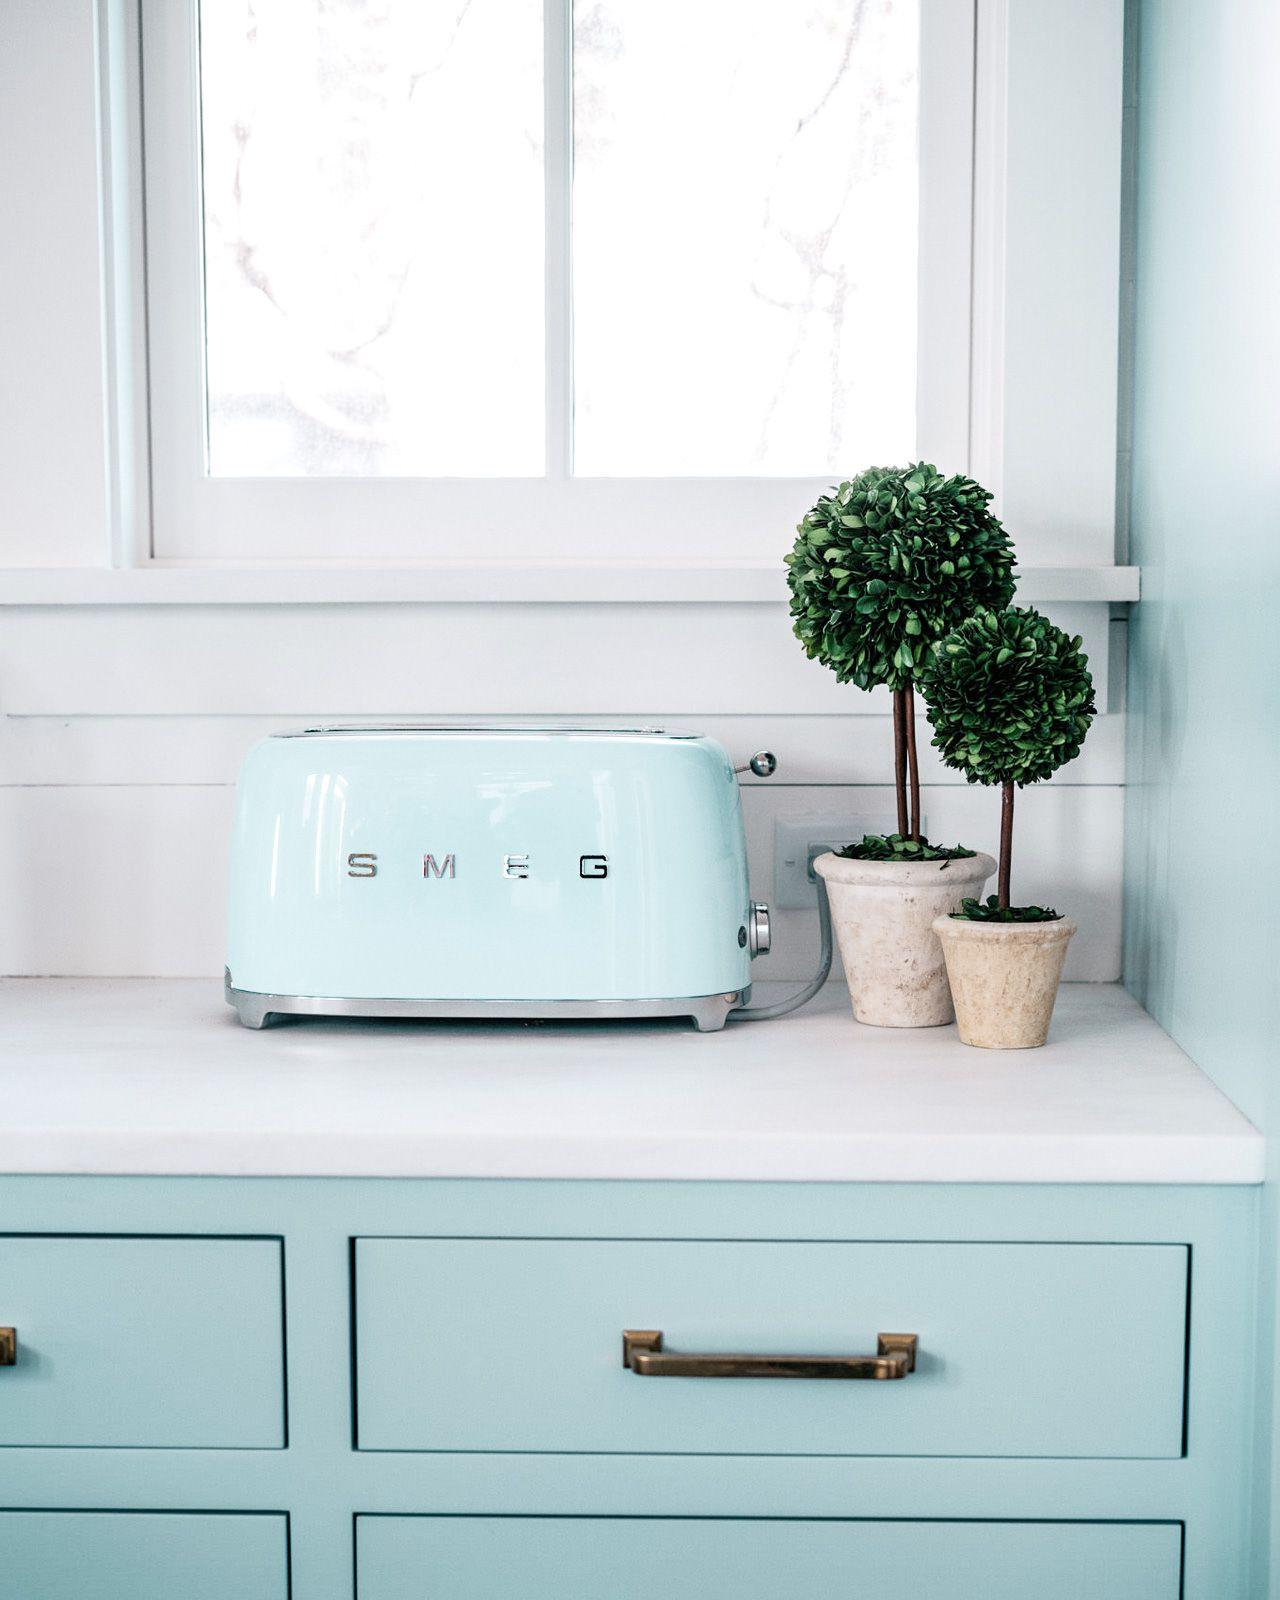 Mint Green Kitchen Decor From Amazon Diy Darlin Green Kitchen Decor Kitchen Decor Mint Green Kitchen